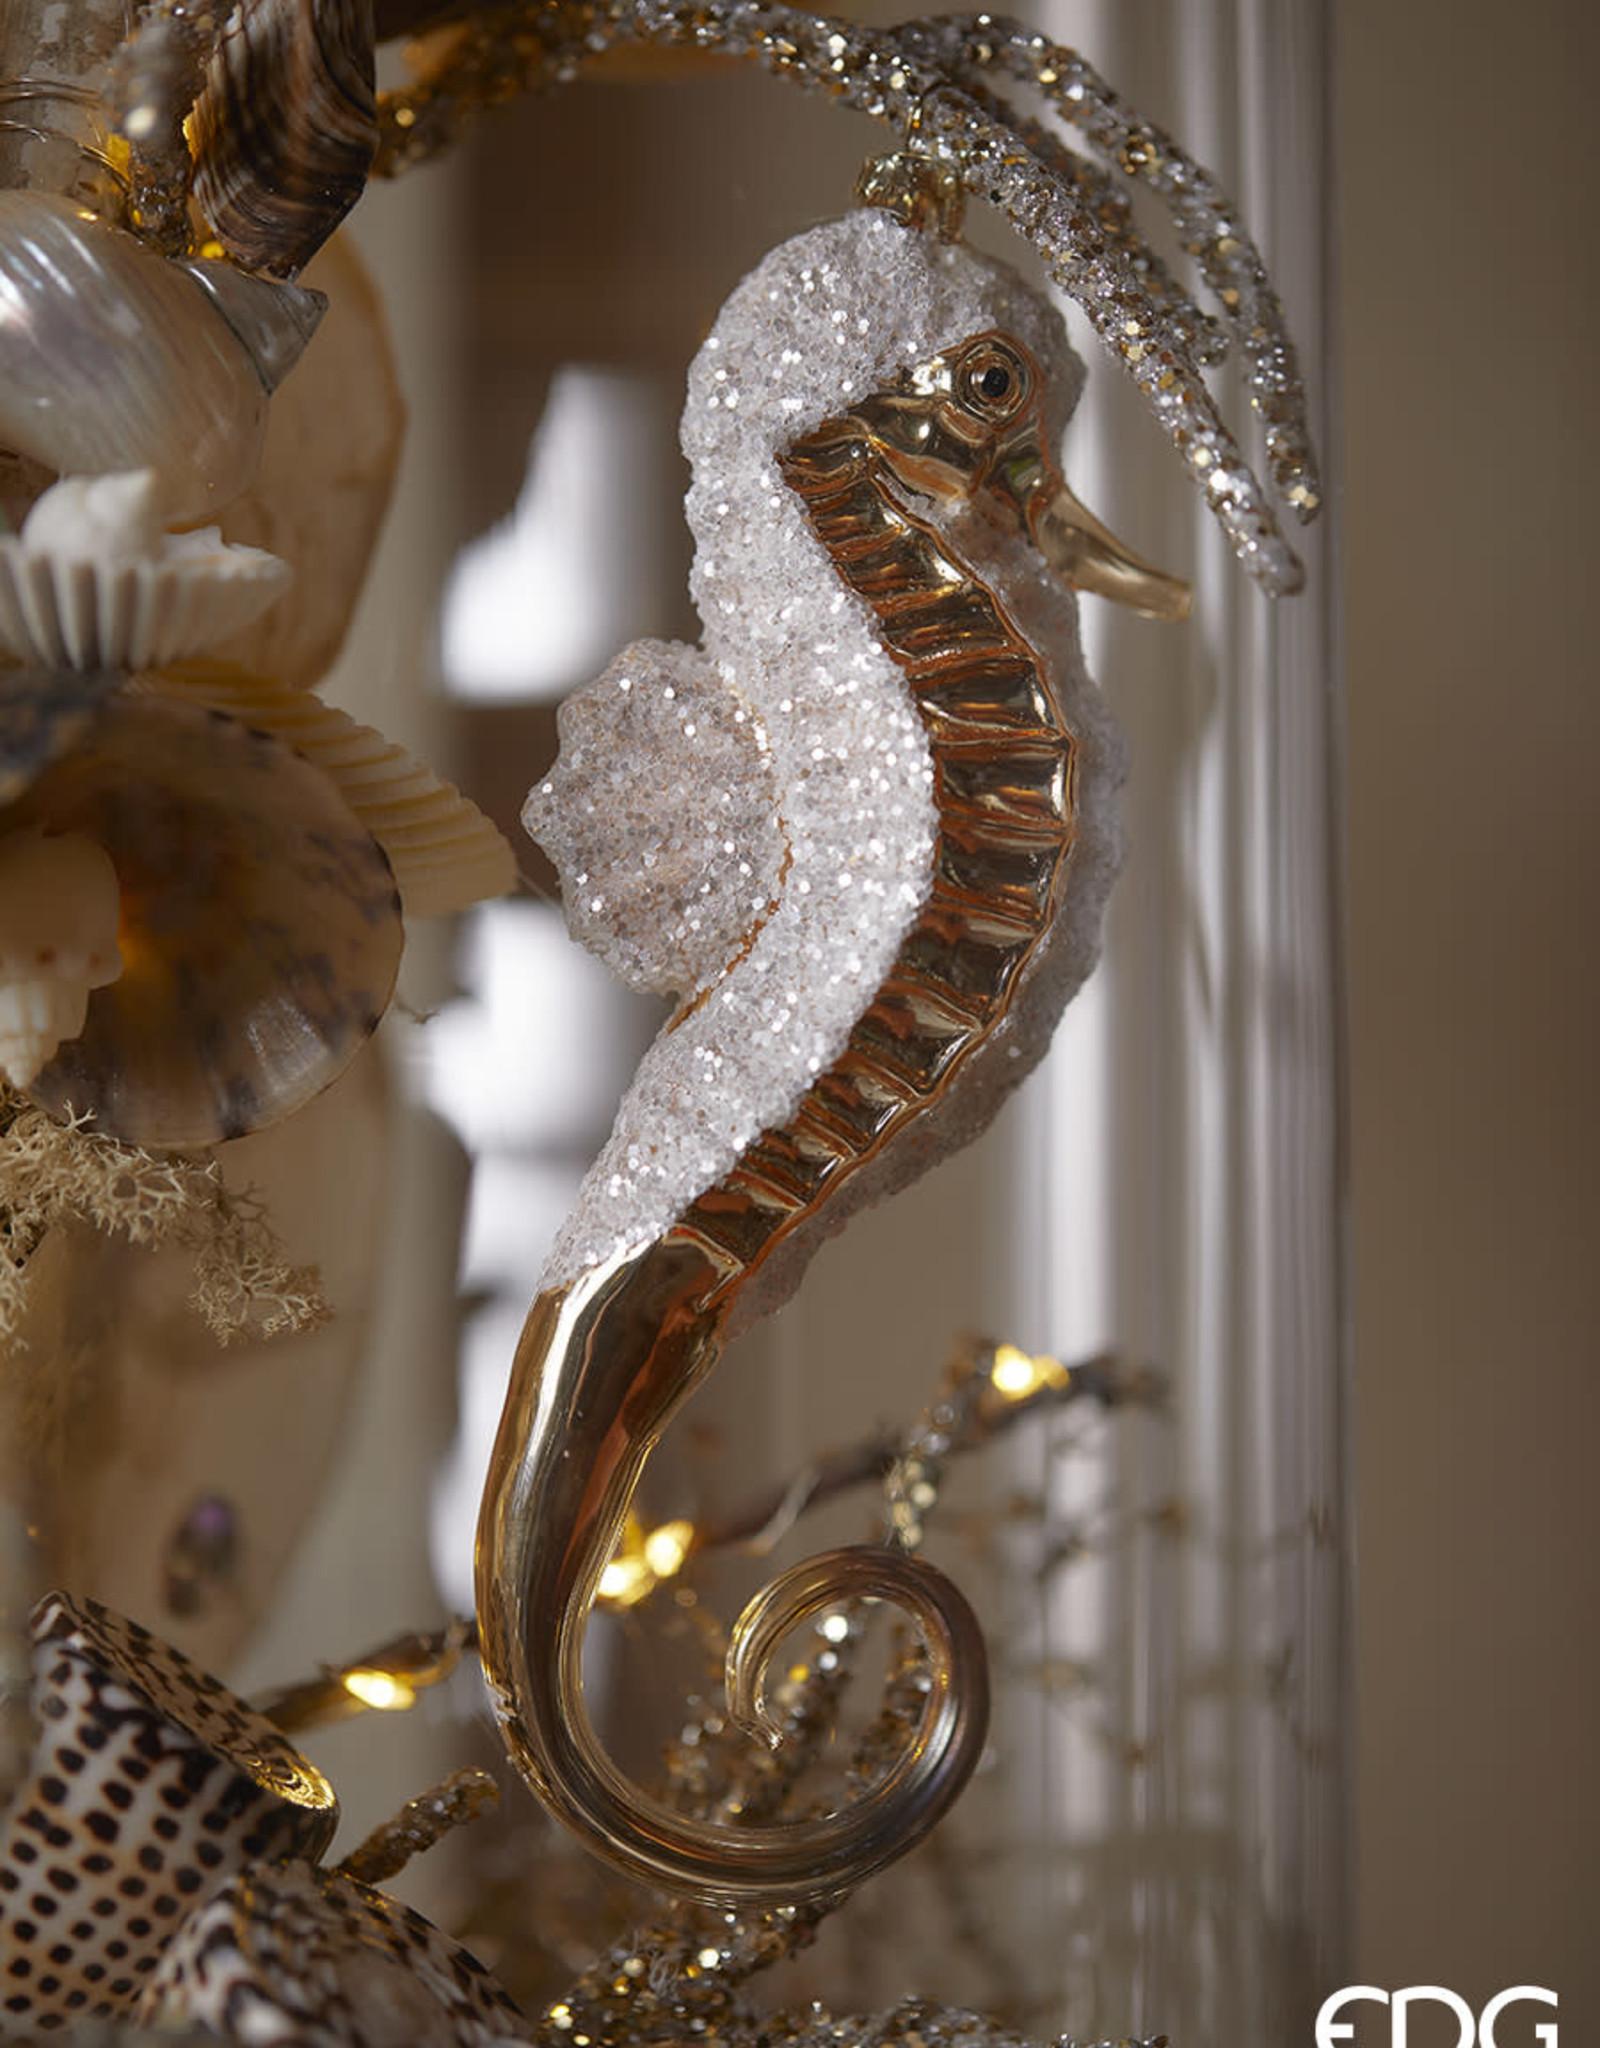 EDG Zeepaardje H18 B8 goud